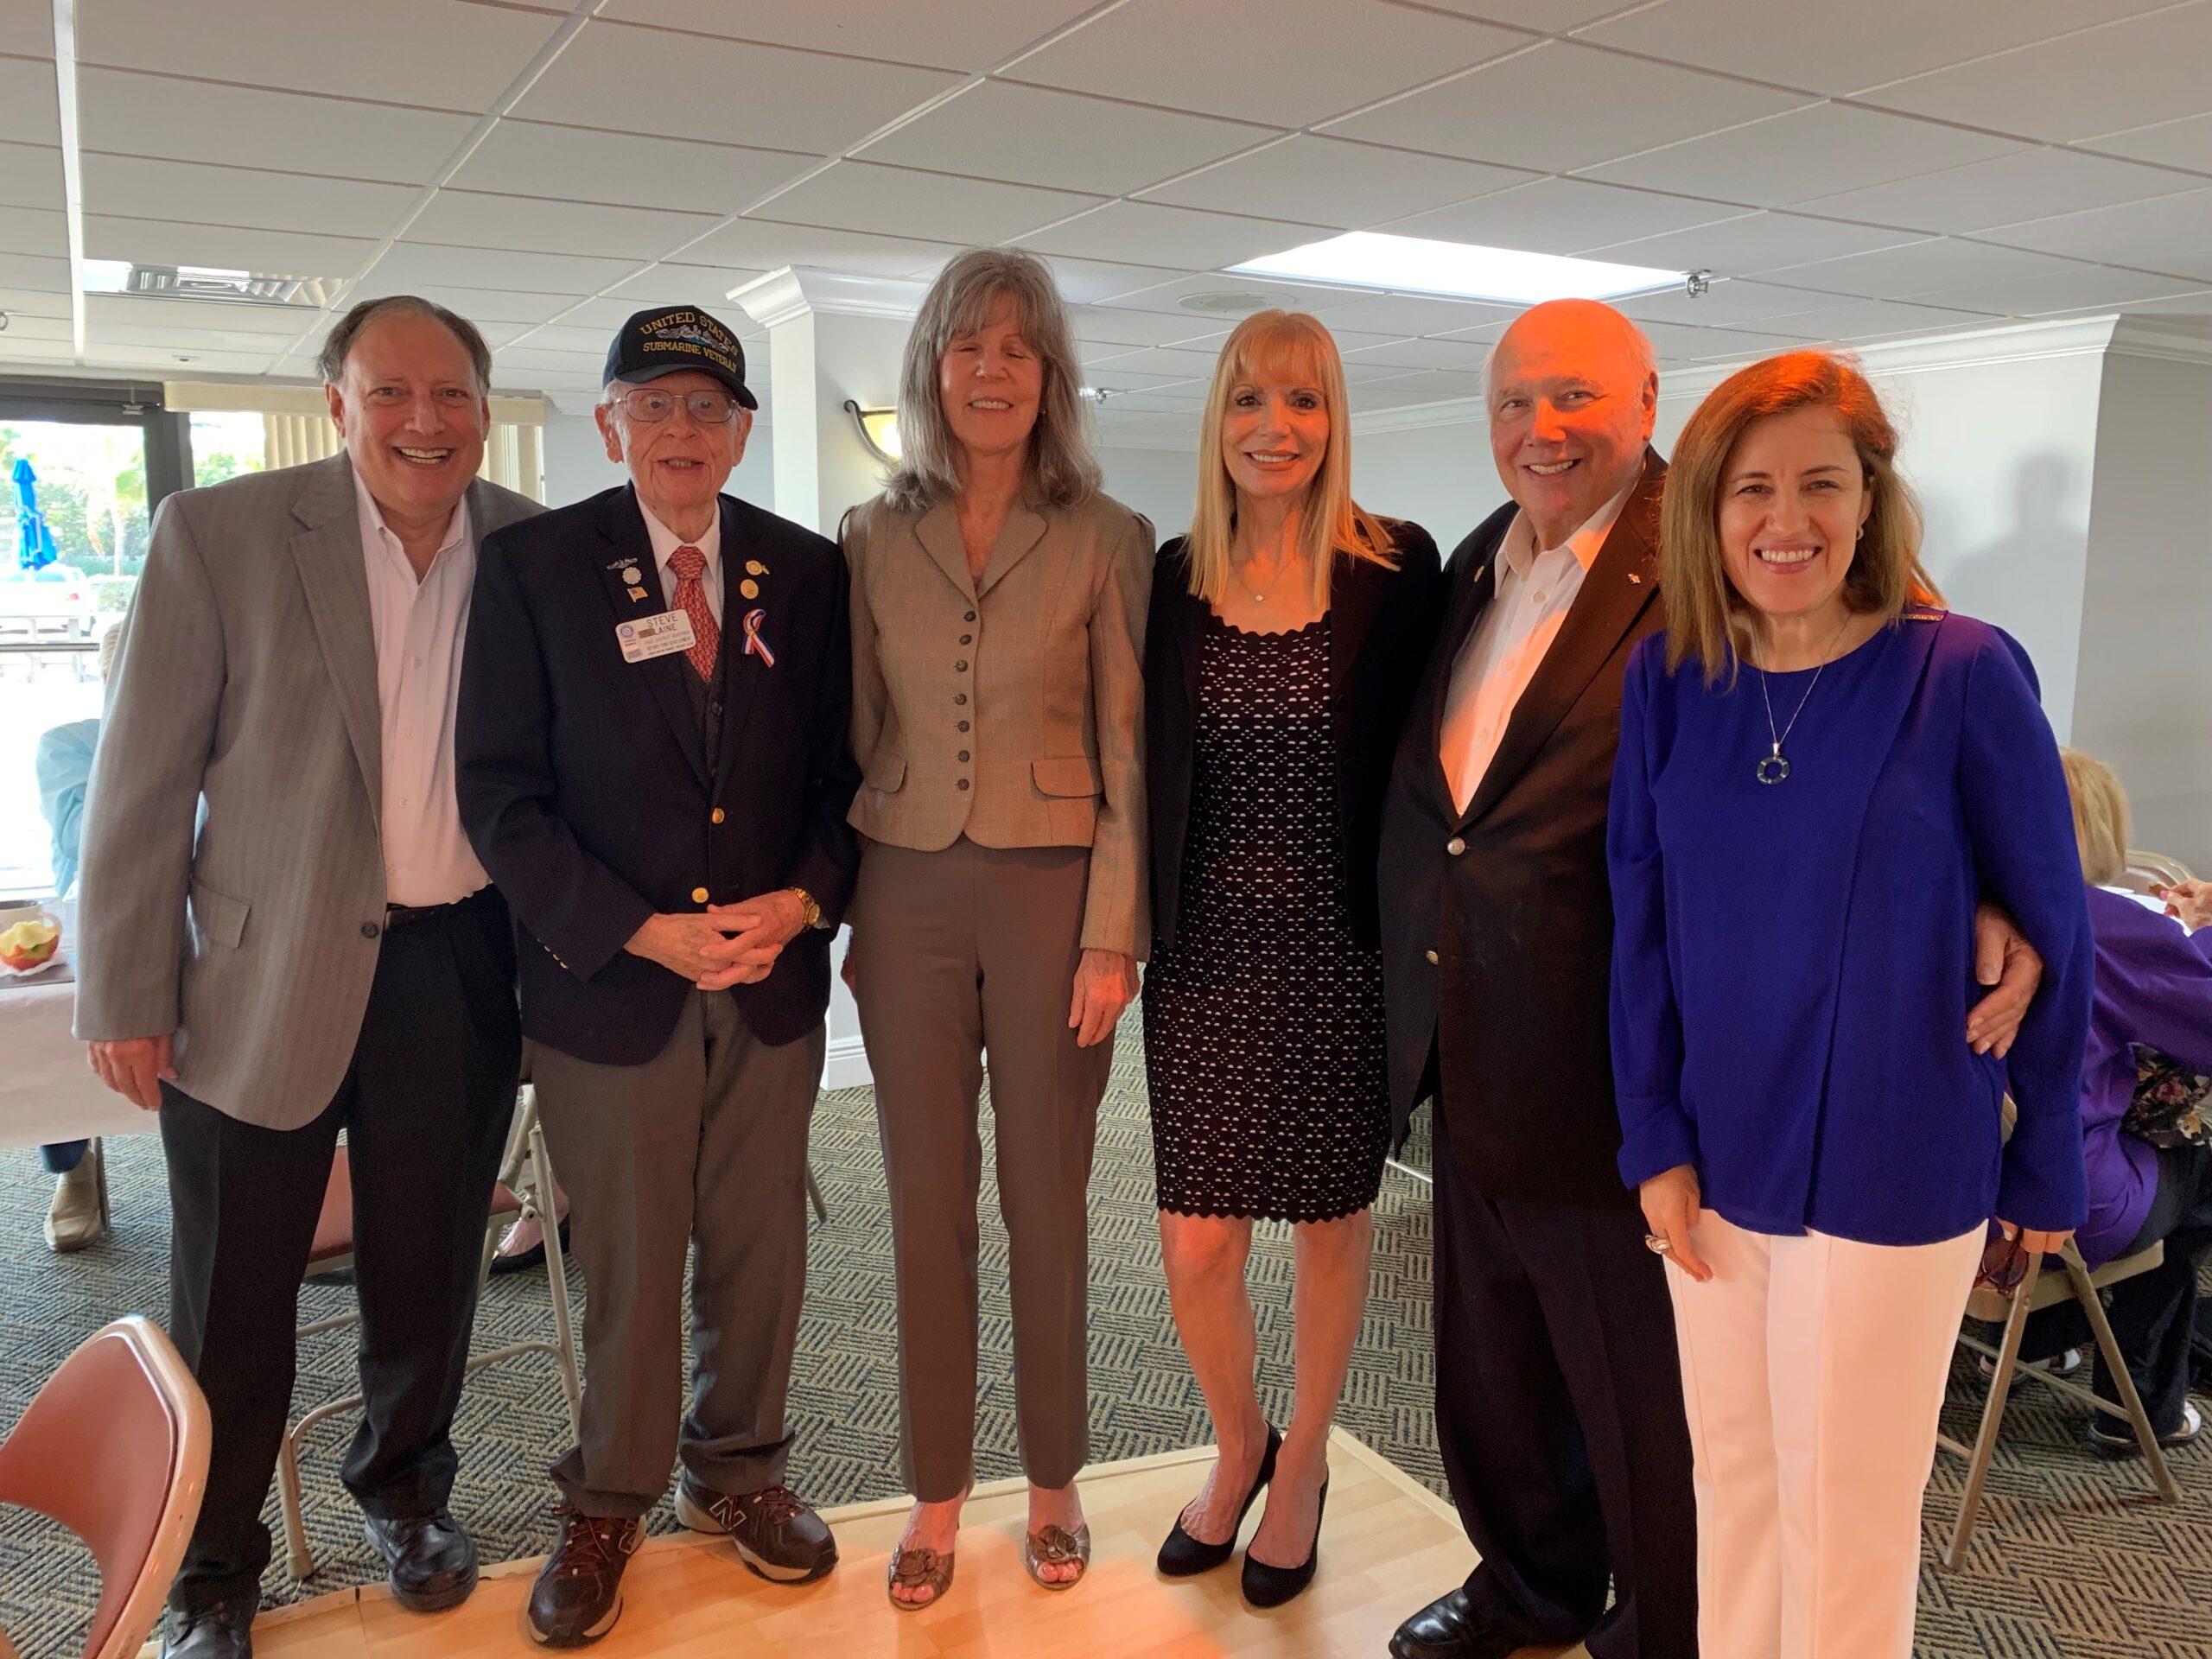 BCA Board Family with Emily Gentile, Steve Lane, Bernard Featherman, Ana Londono, Russel Edelstein, and Ann Gannon, Palm Beach Tax Collector